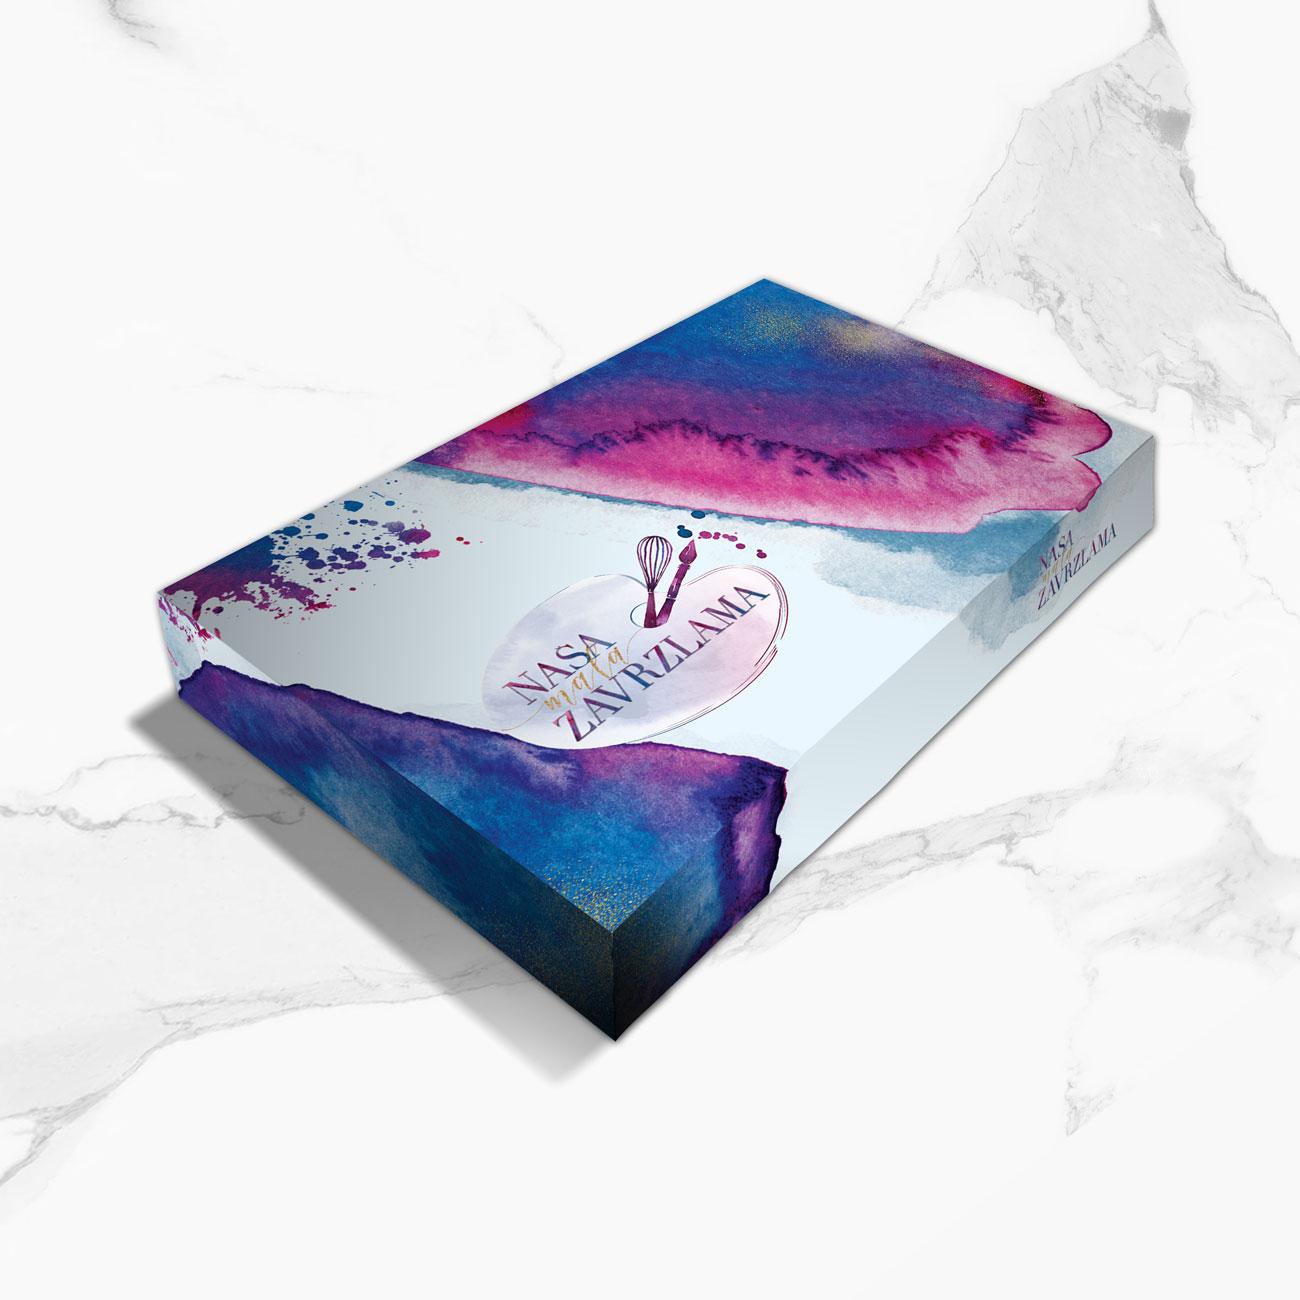 Cake packaging design by Ana Balog design